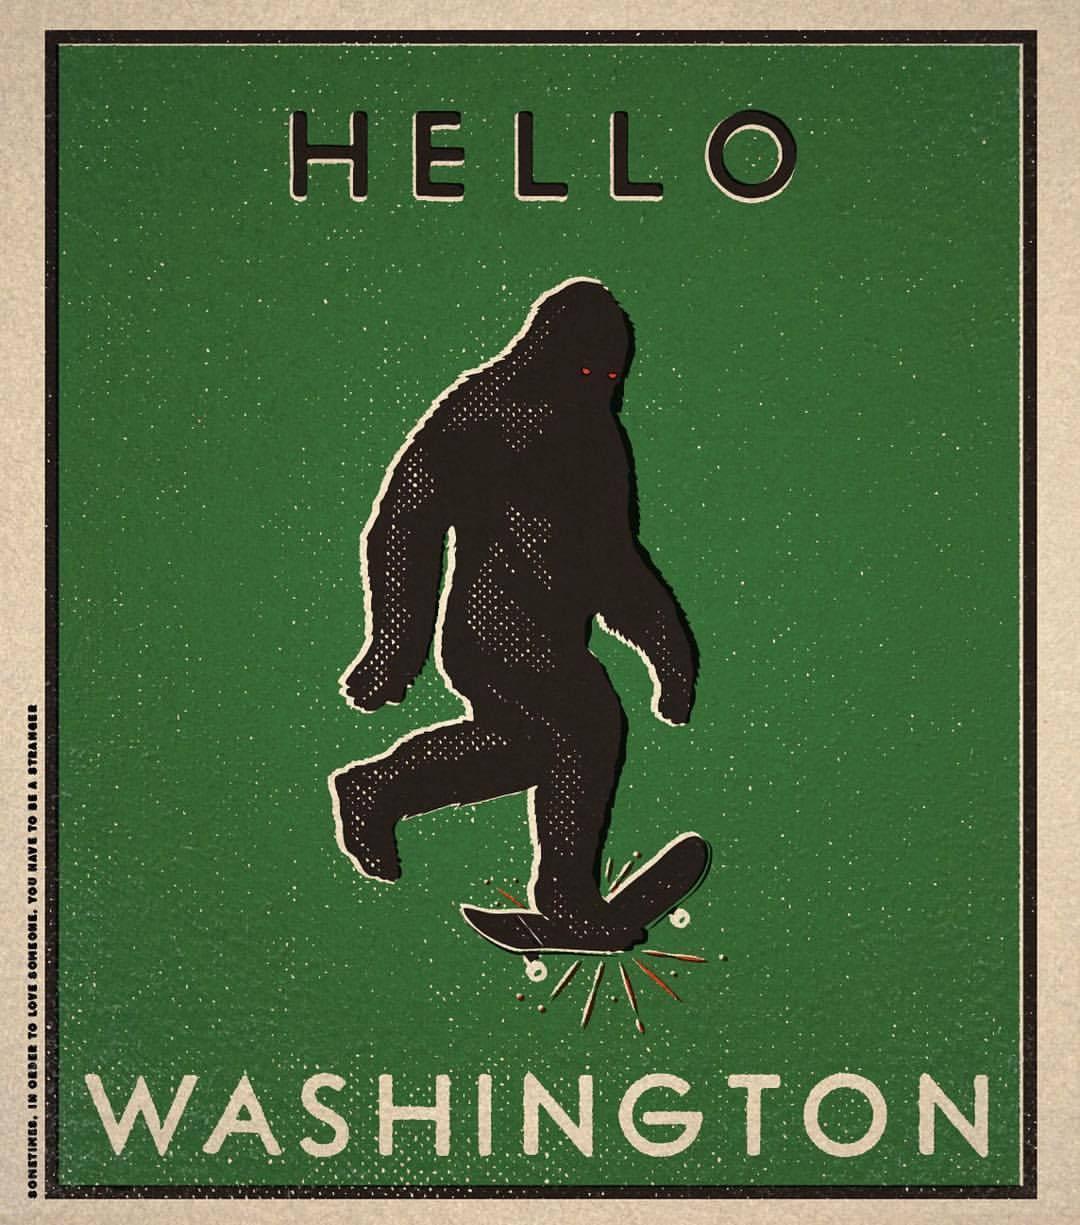 HigherEd-AndyPitts-Place-Washington.jpg